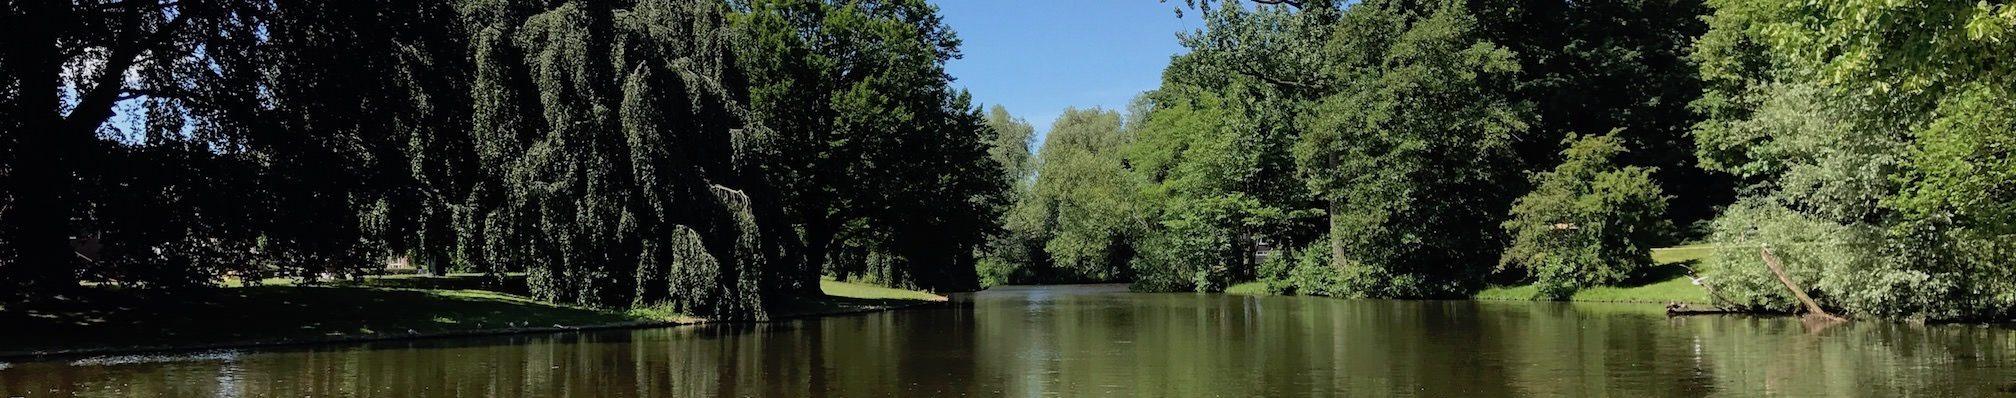 Groningen, Noorderplantsoen, Teich am Parkeingang